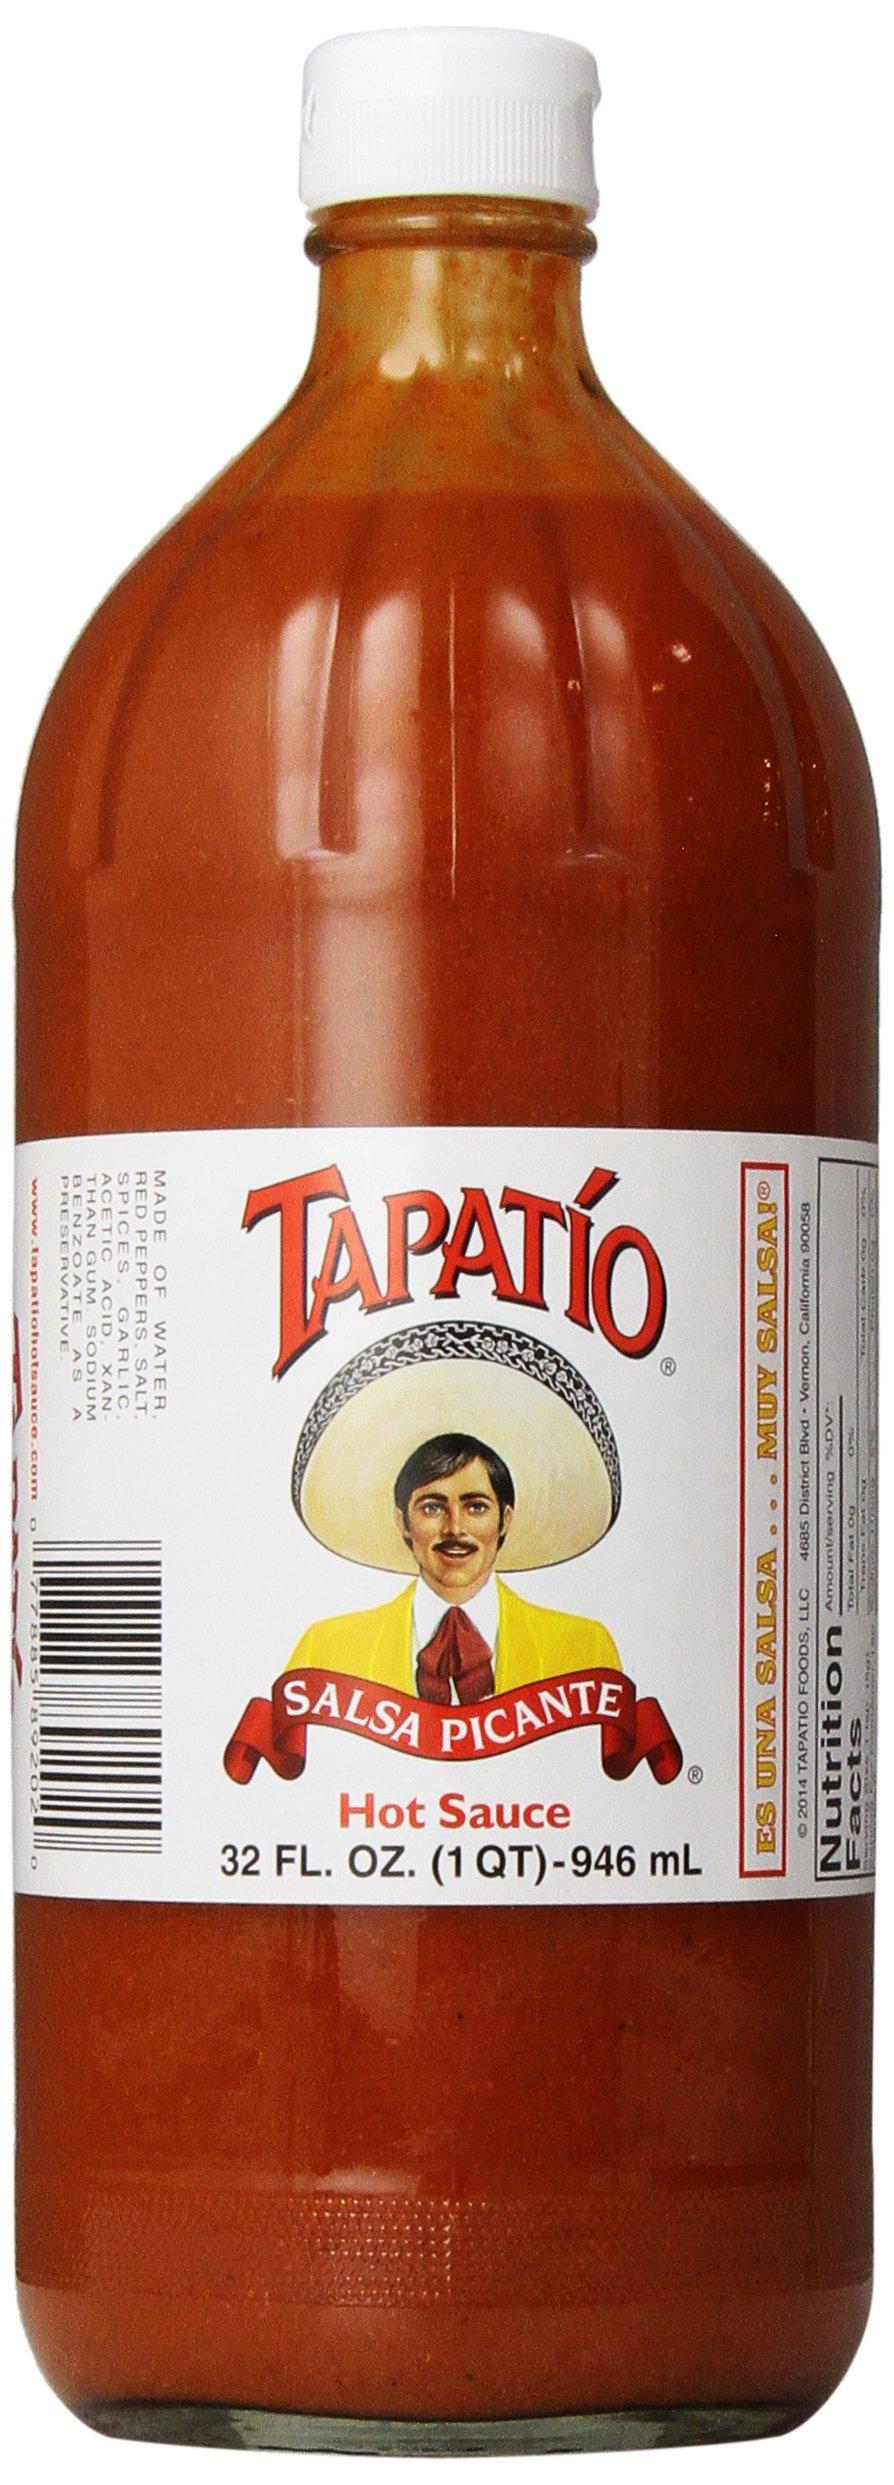 Tapatio Salsa Picante Hot Sauce, 32 Fl Oz